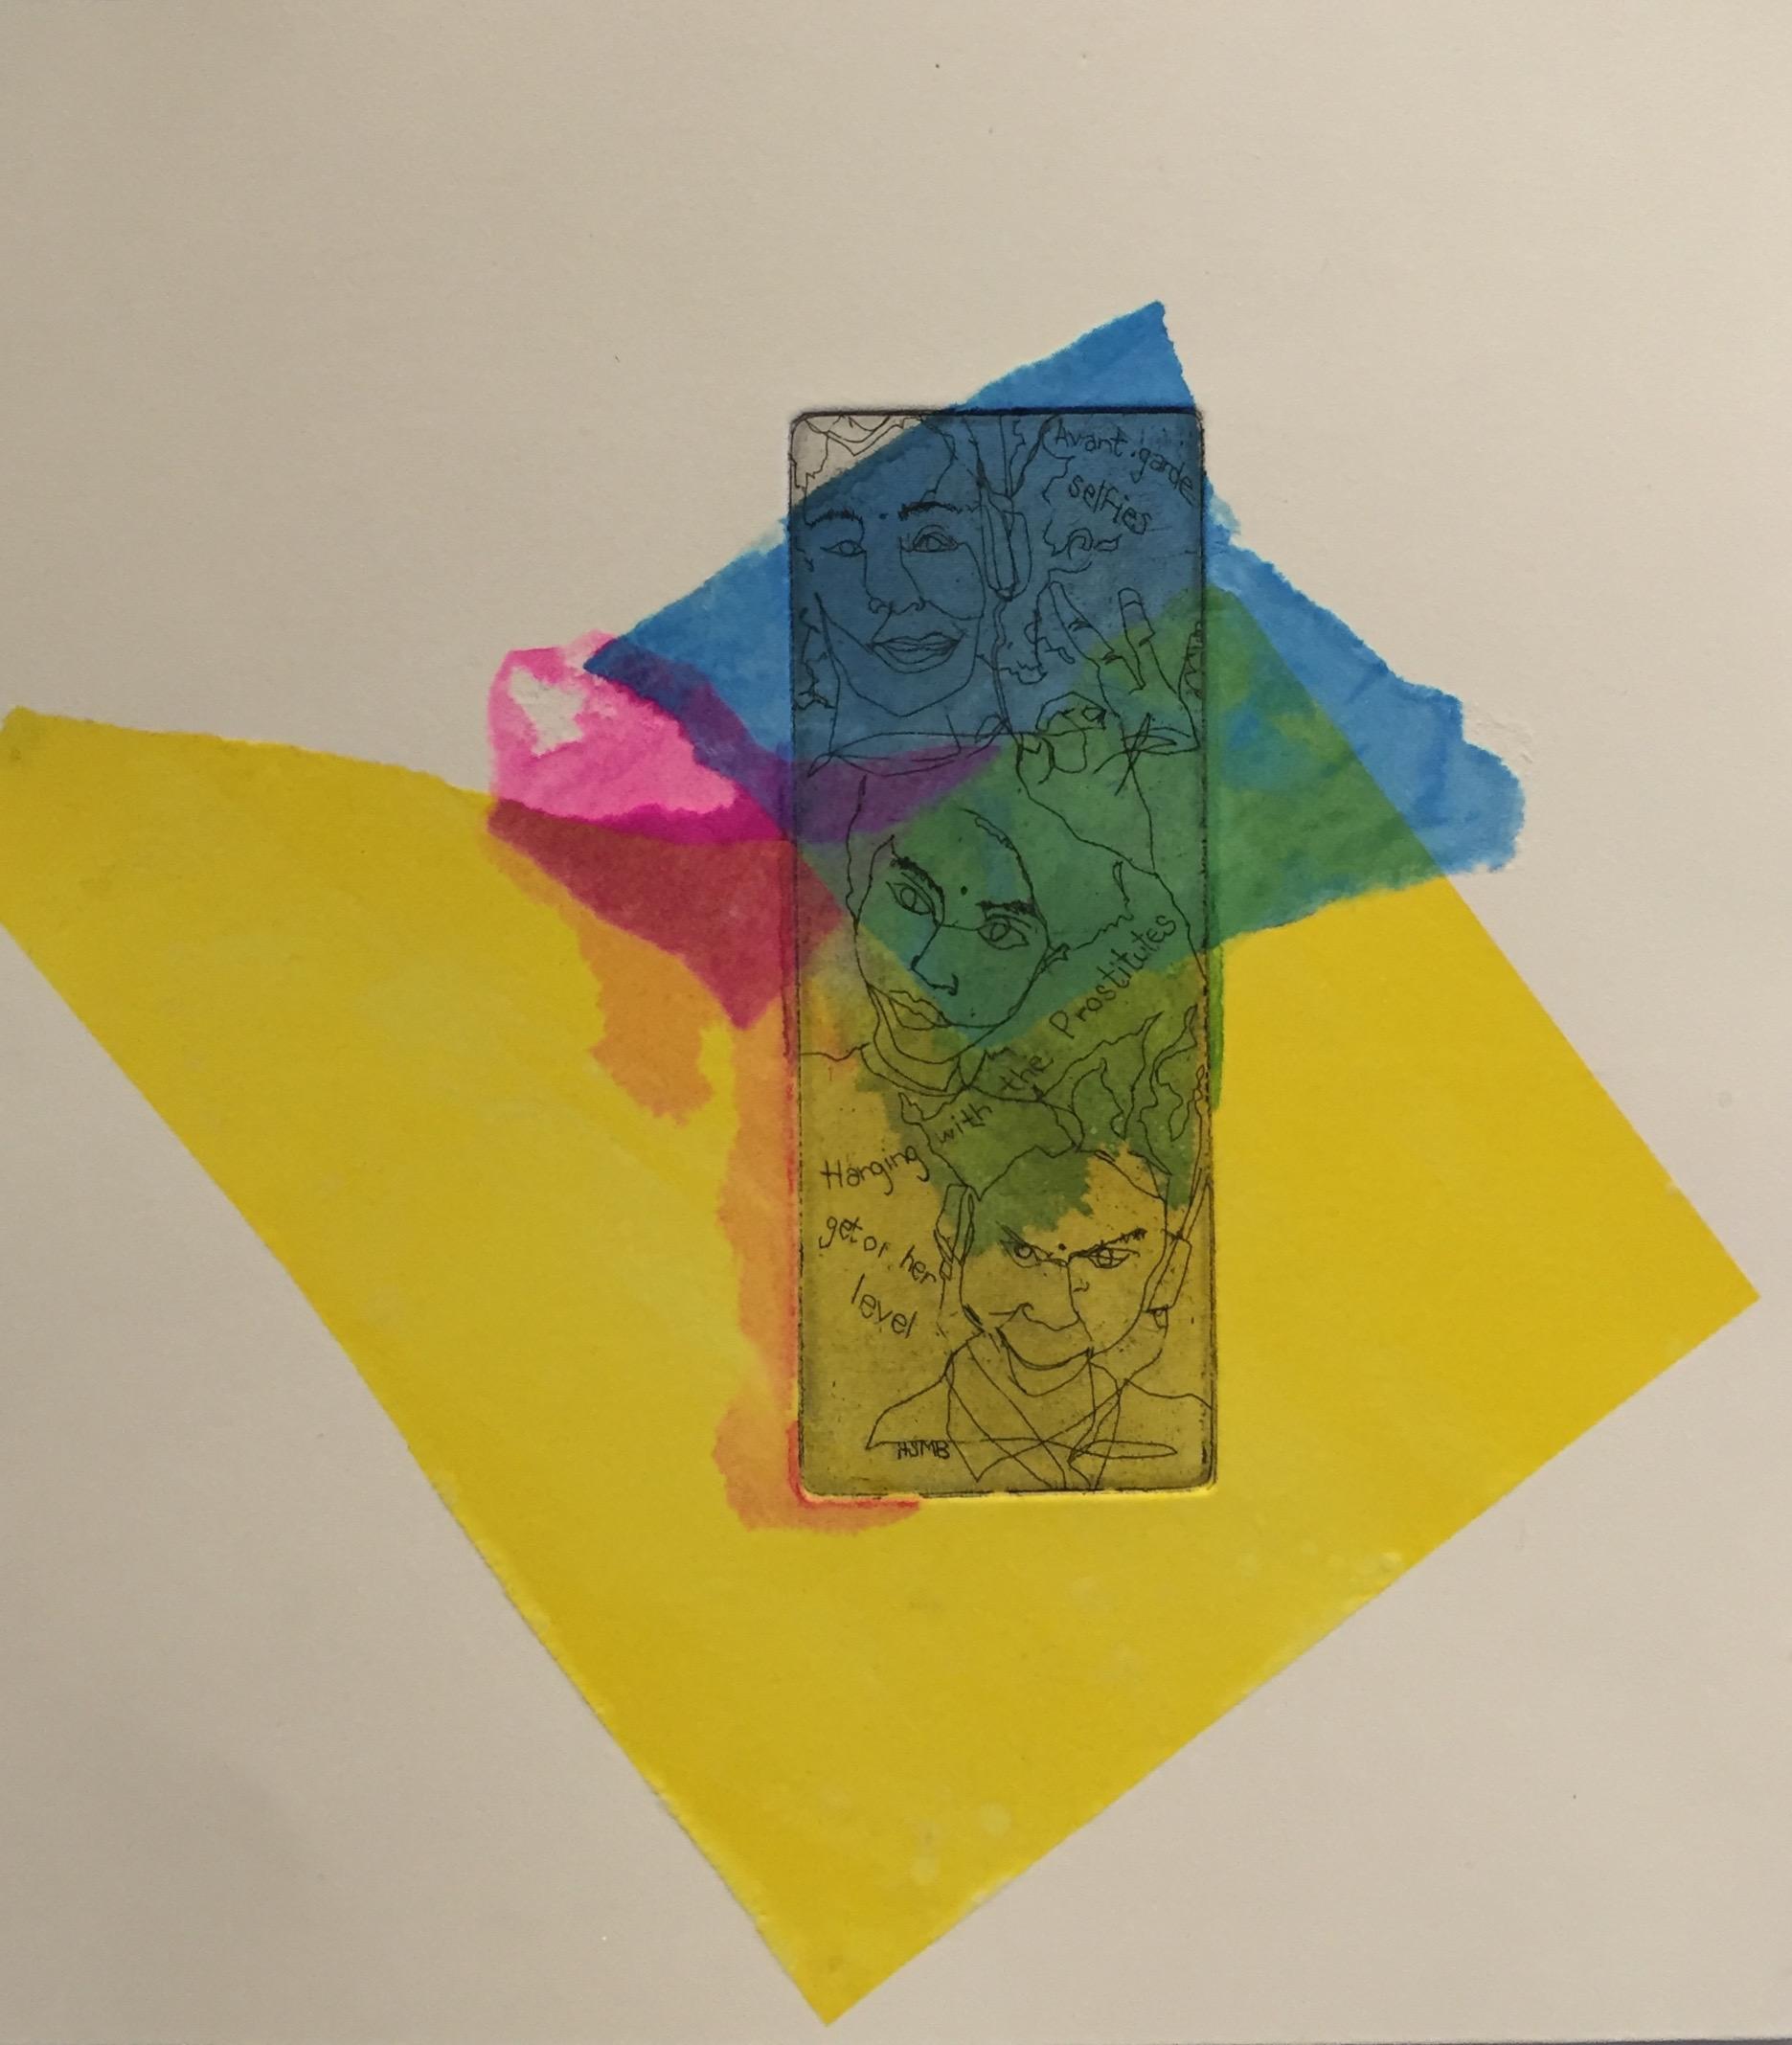 YAMATA BERNARD About Her etching, chine-collé